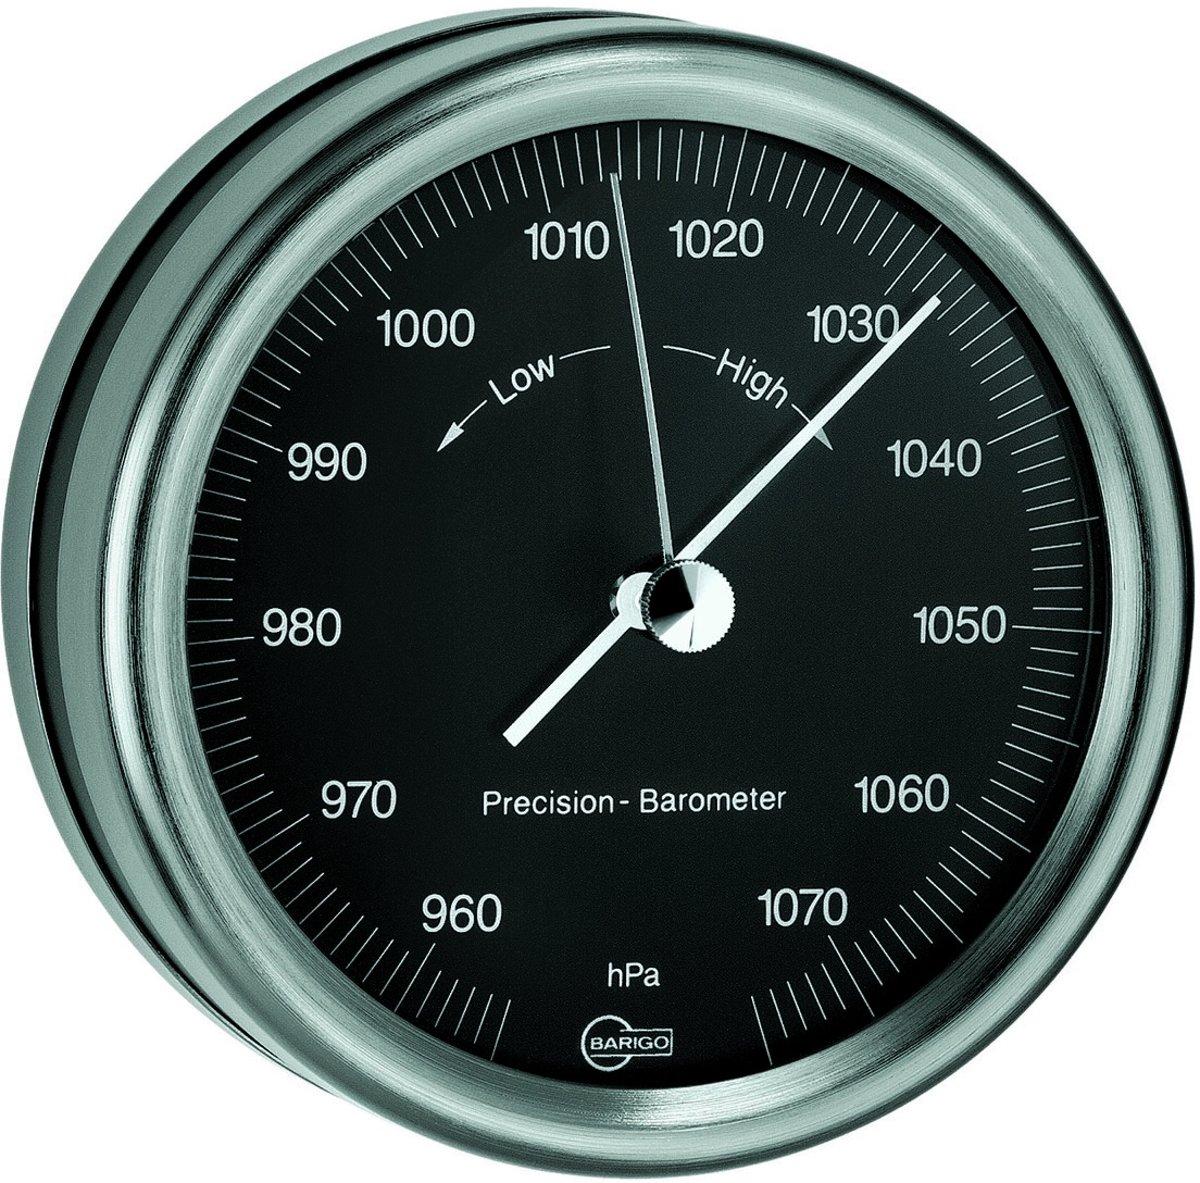 Barigo 823zw barometer zwart gelakt edelstaal kopen